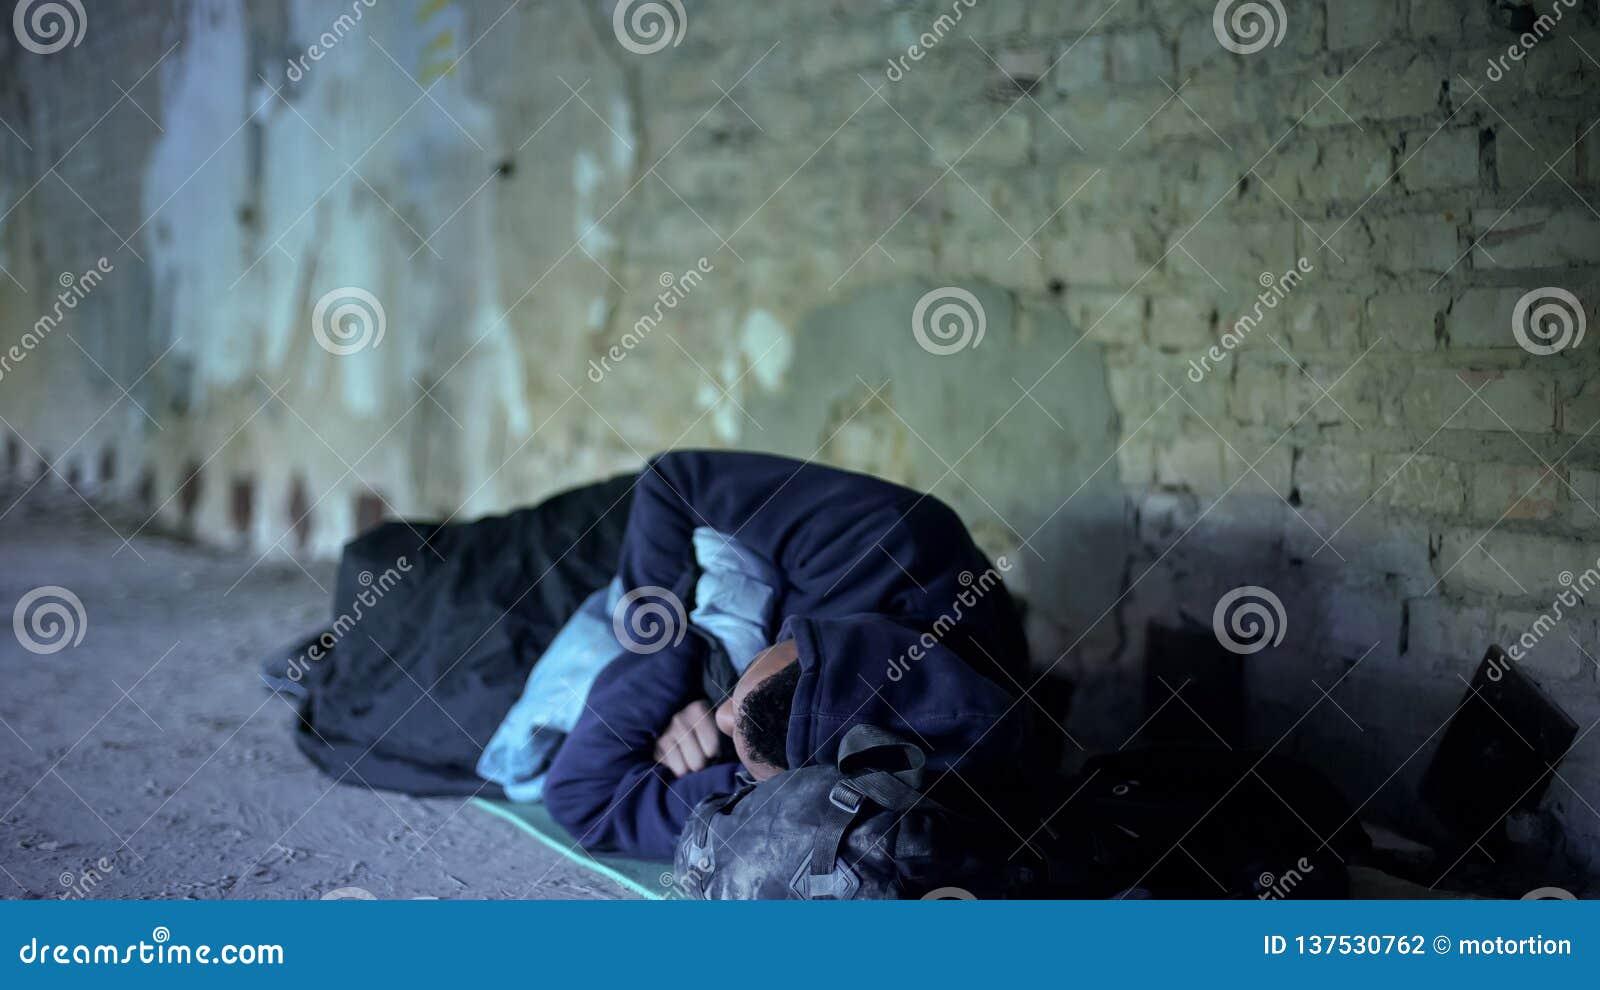 Adolescente desabrigado que dorme na rua, pobreza, sociedade egoísta indiferente